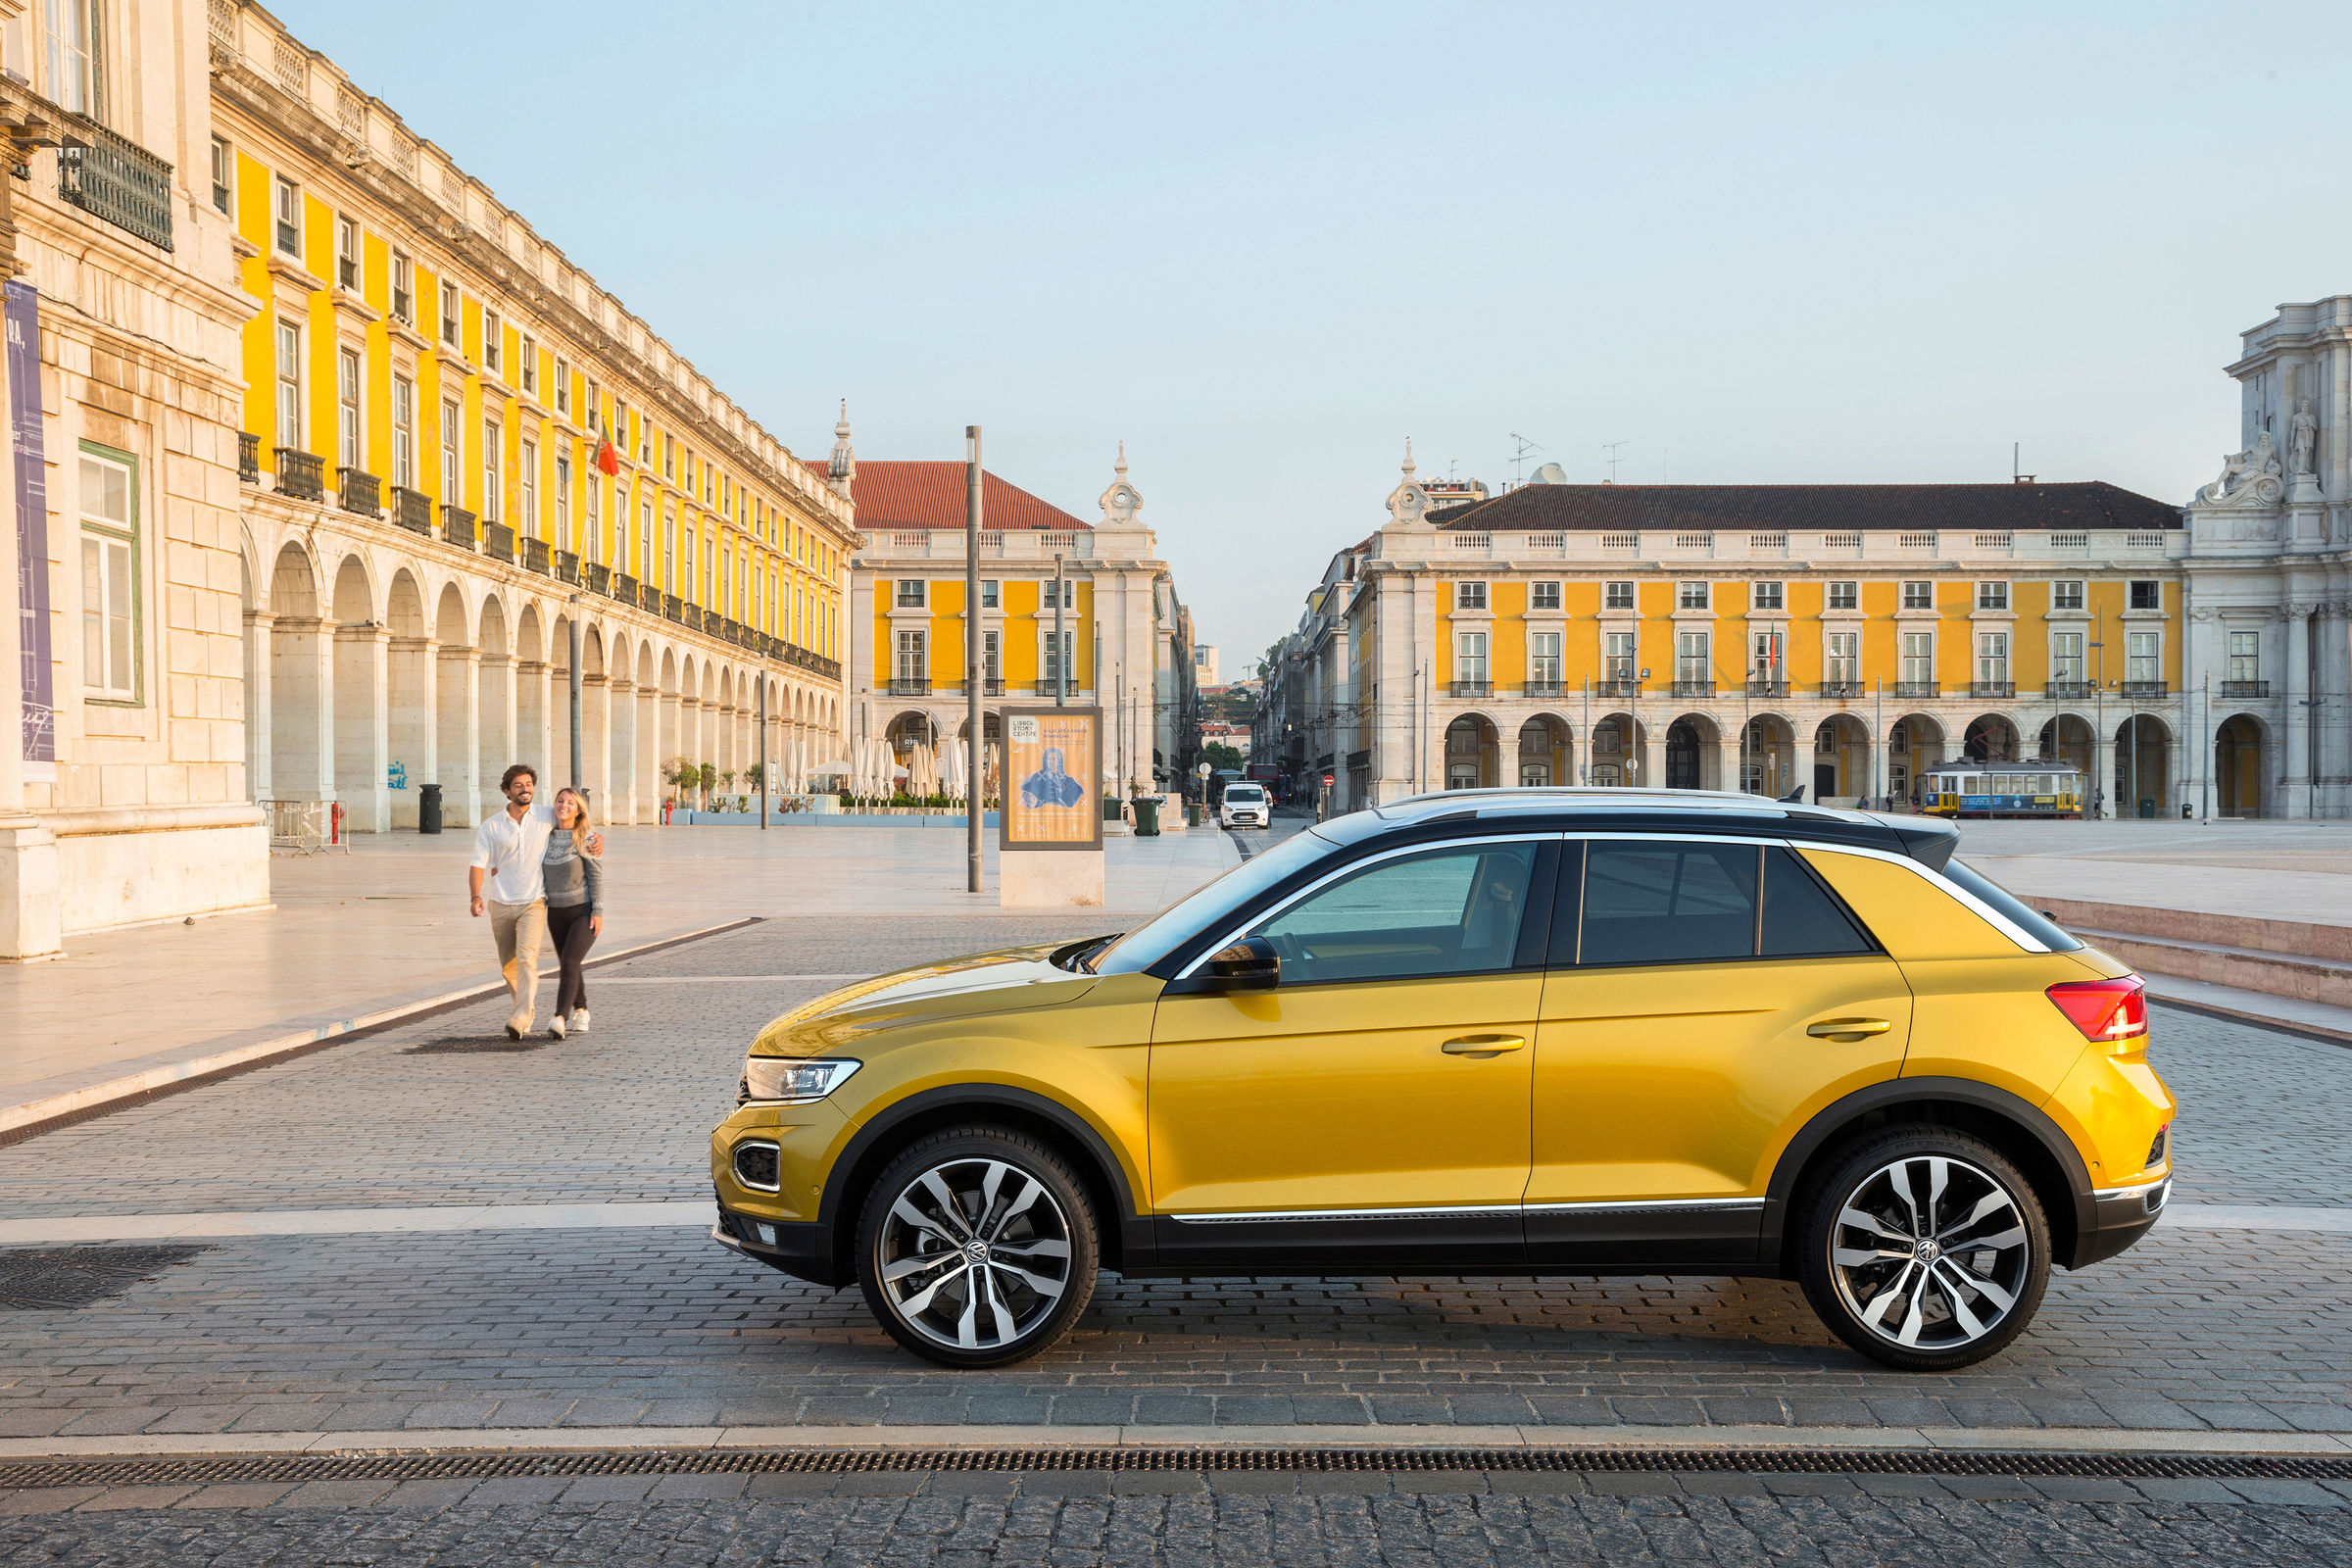 Žltý VW T-roc v meste